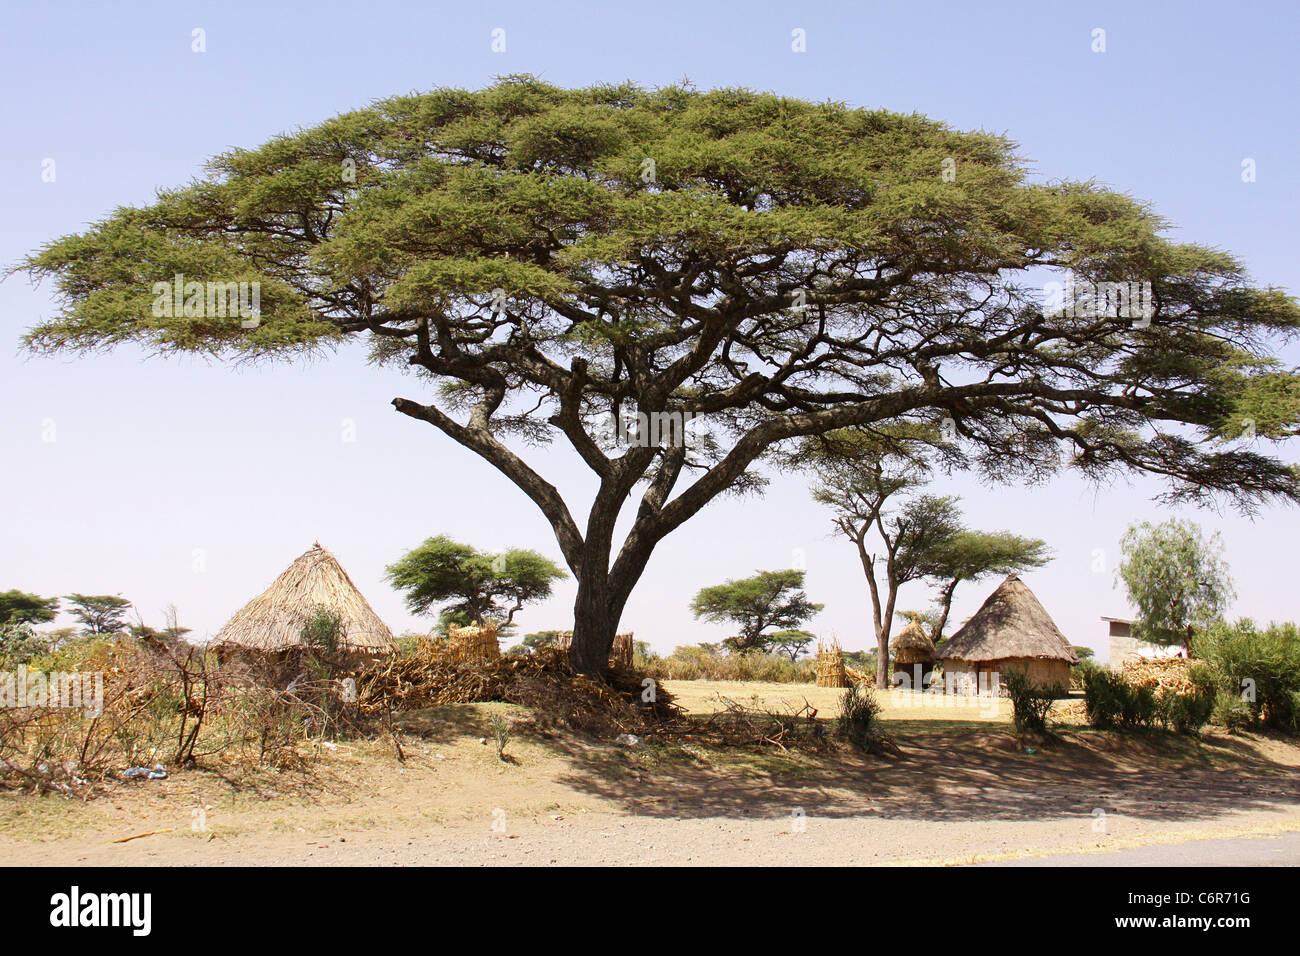 how to draw a acacia tree